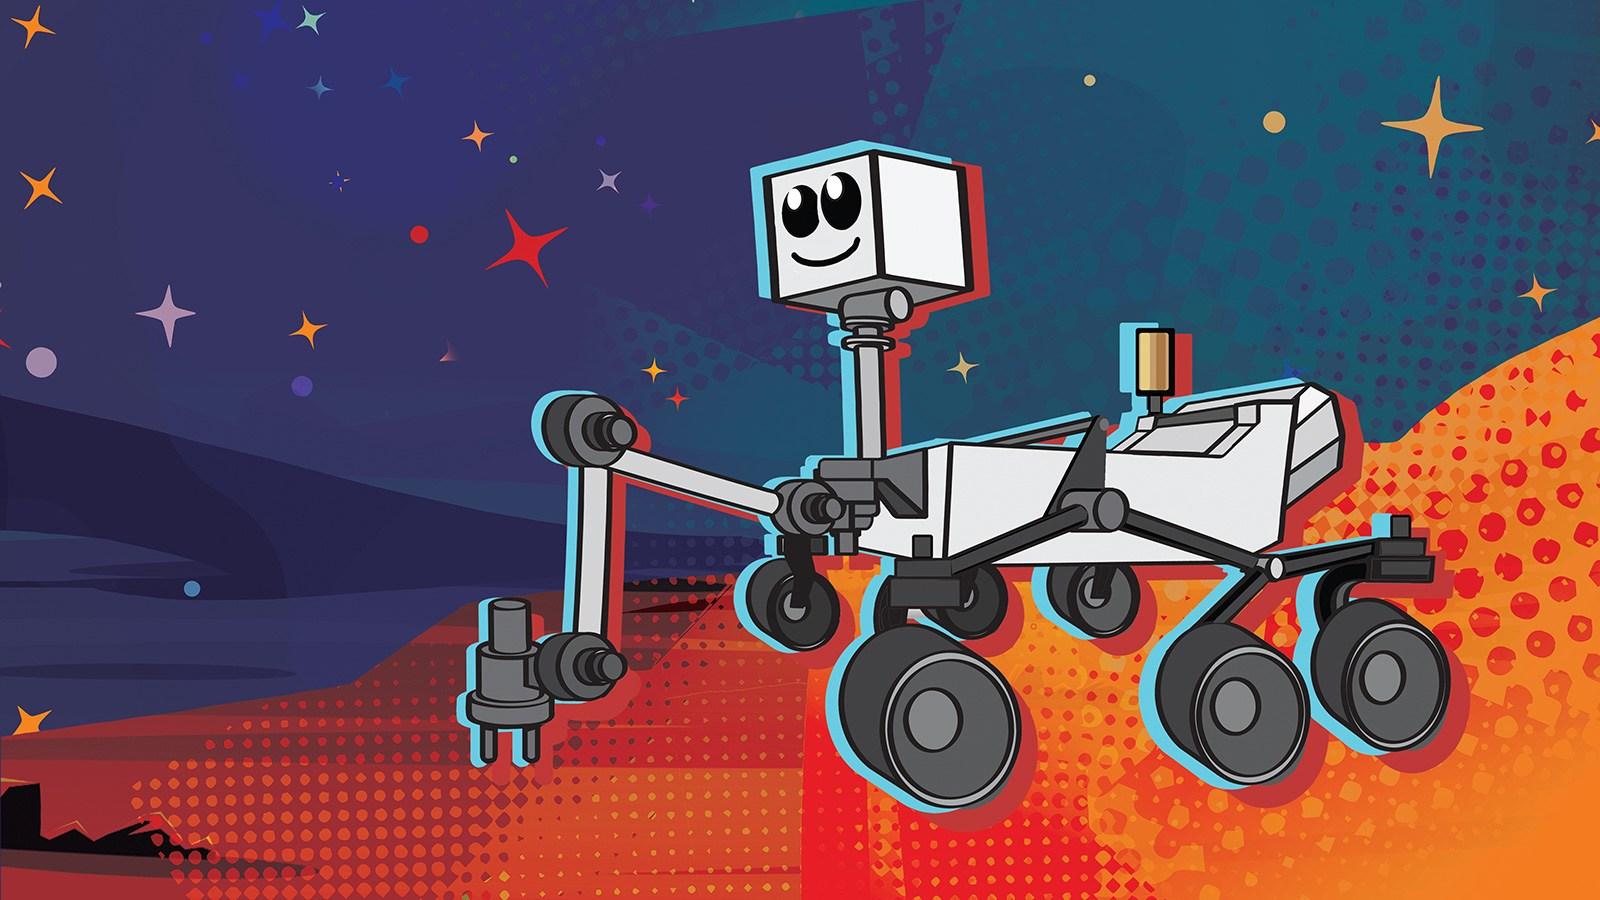 Rover Mars 2020 busca nombre